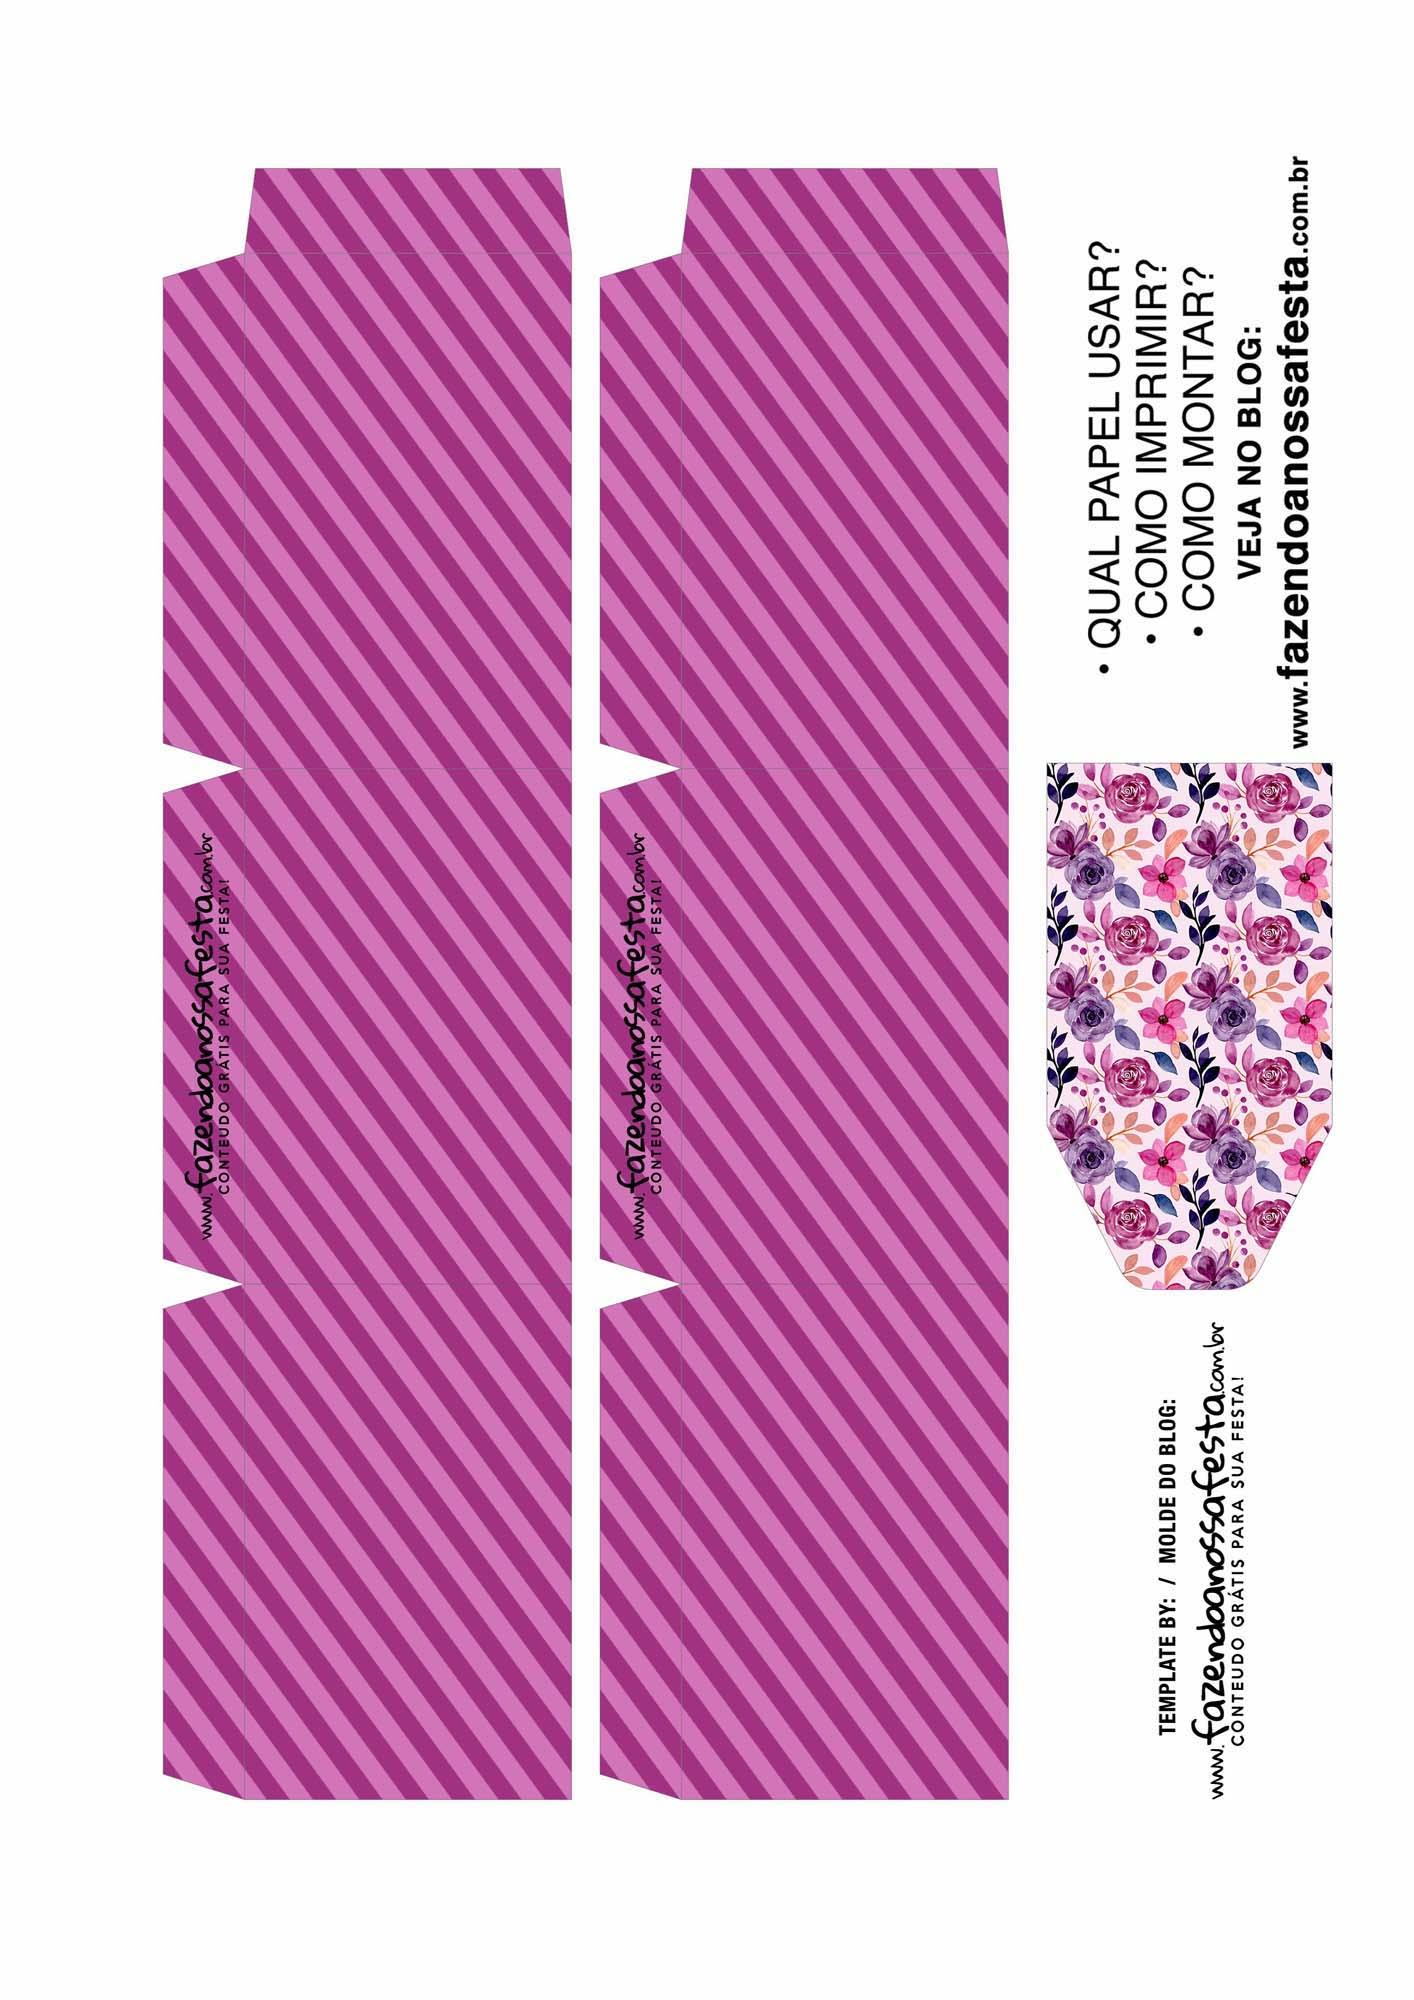 Caixa Explosiva Dia das Maes floral rosa e roxo 2